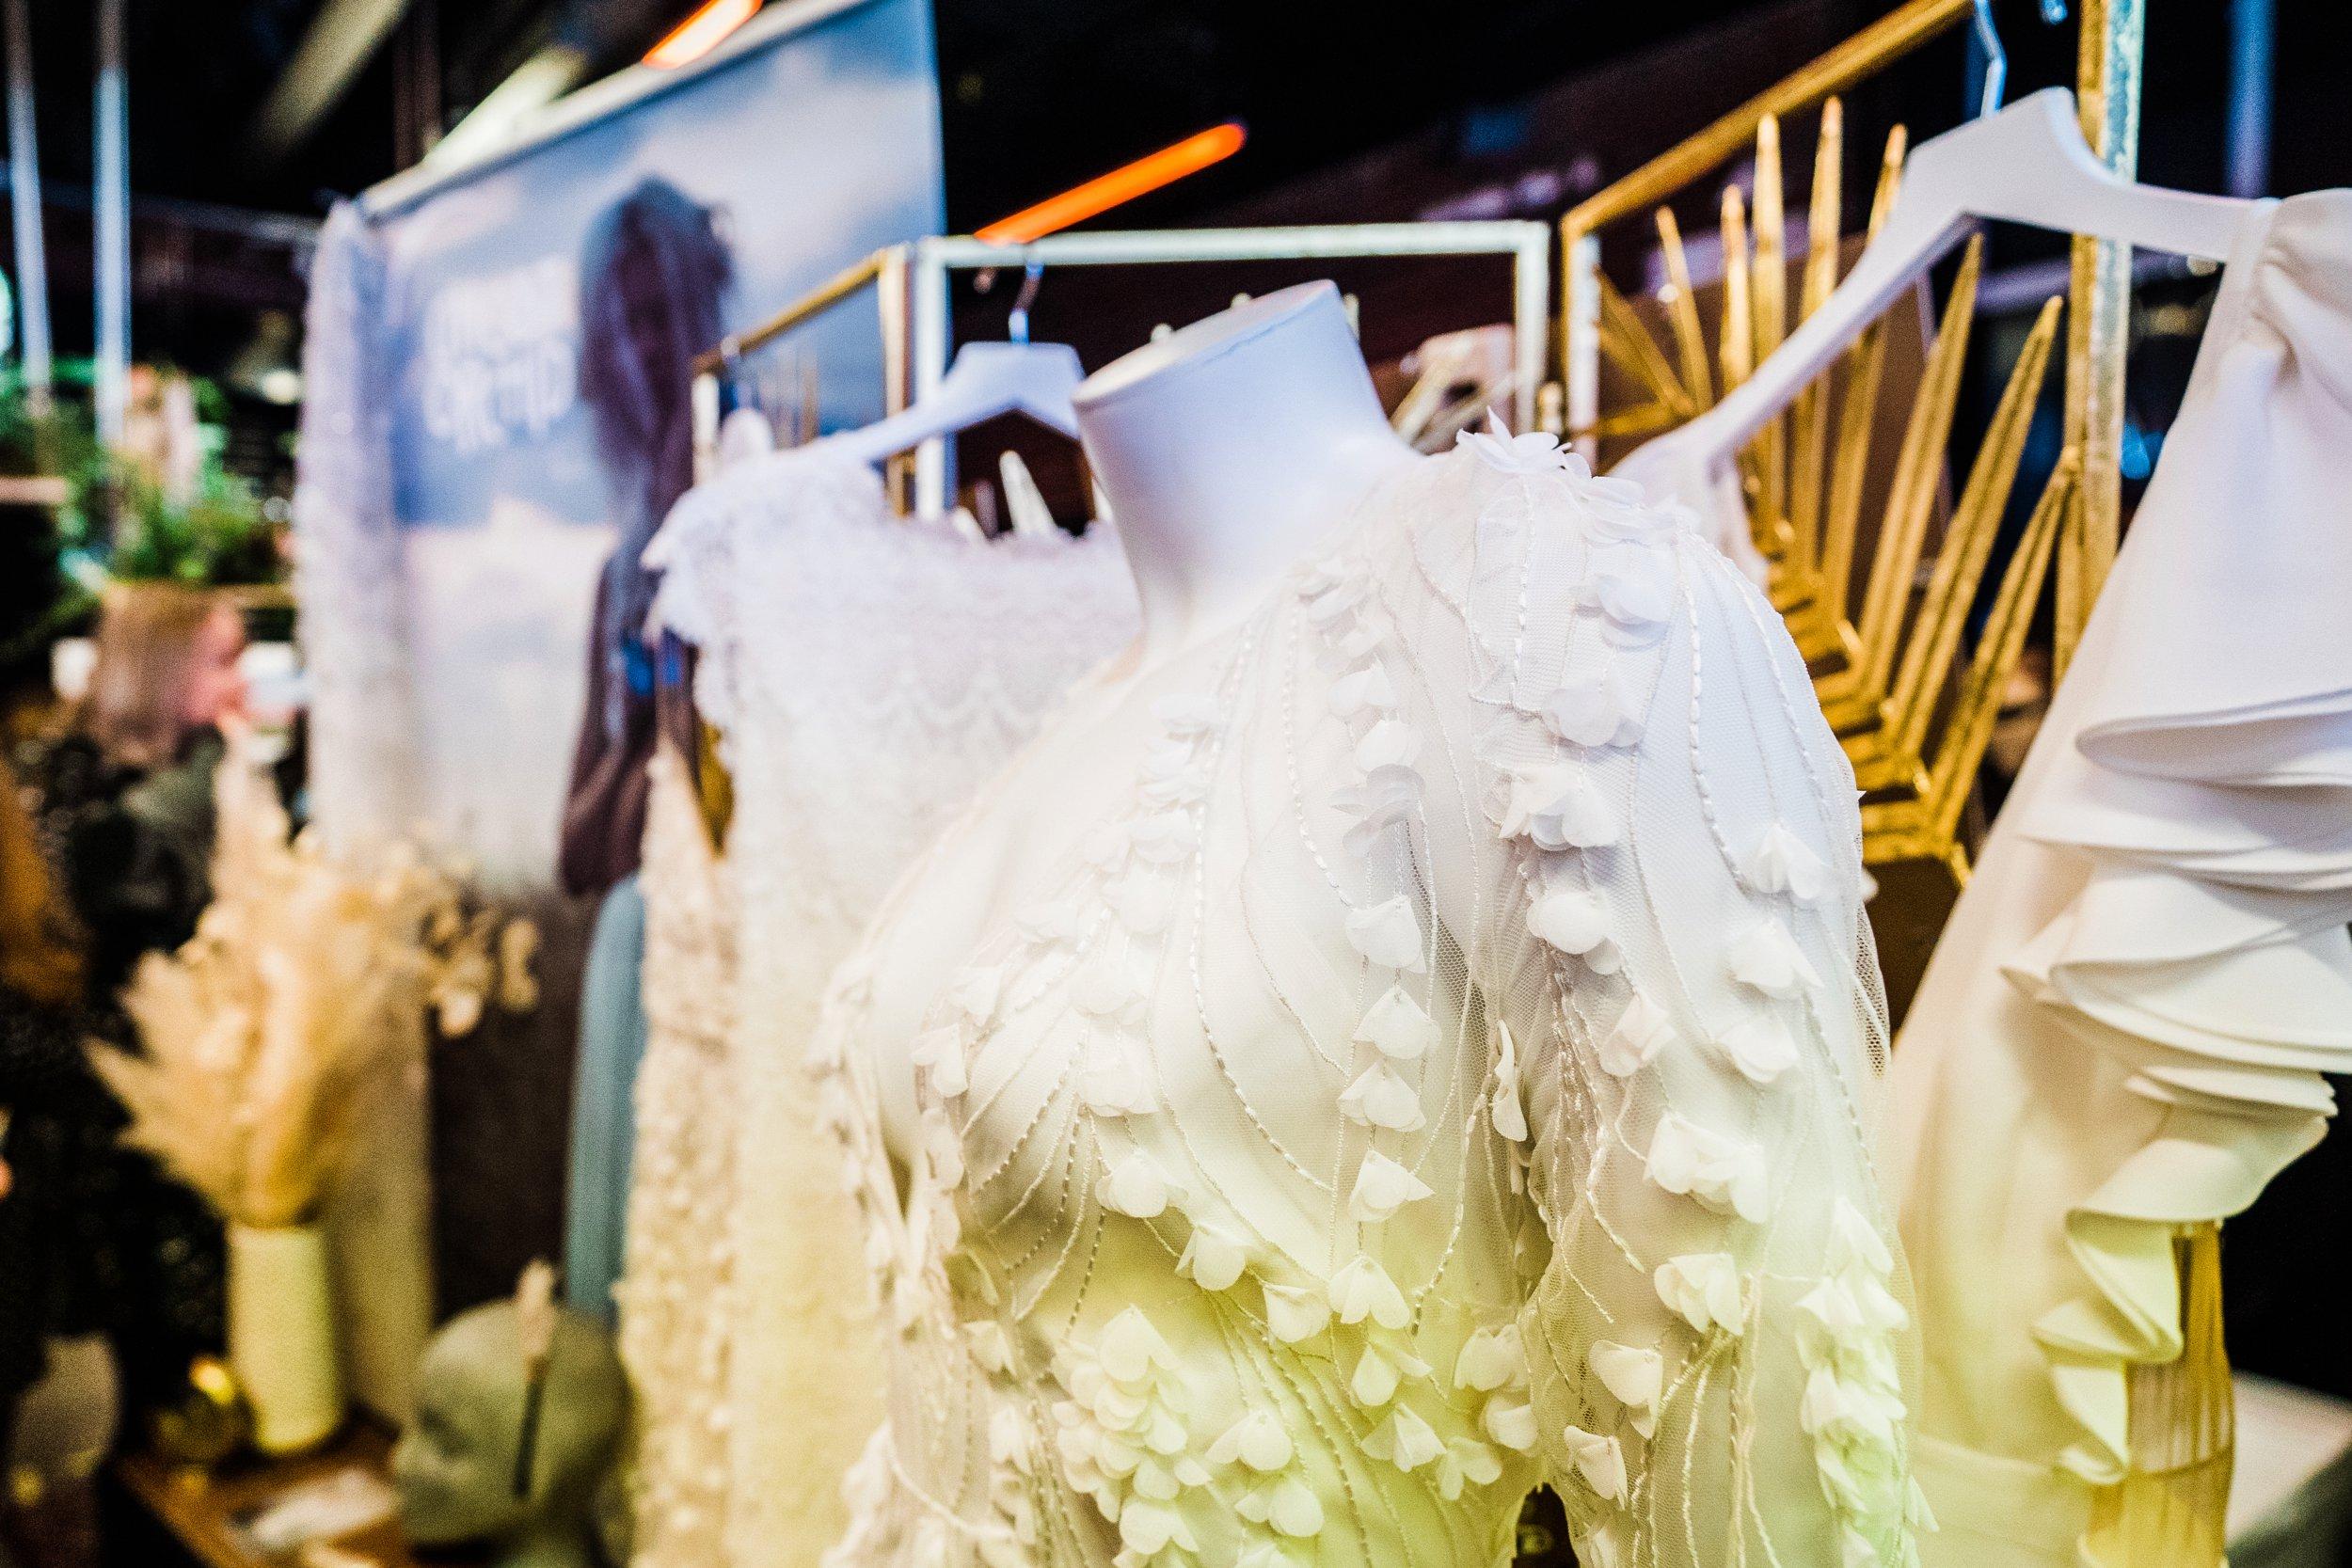 The UN-WEDDING SHOW 2019 cool bride style modern wedding fair Leeds Duke Studios 00016.jpg